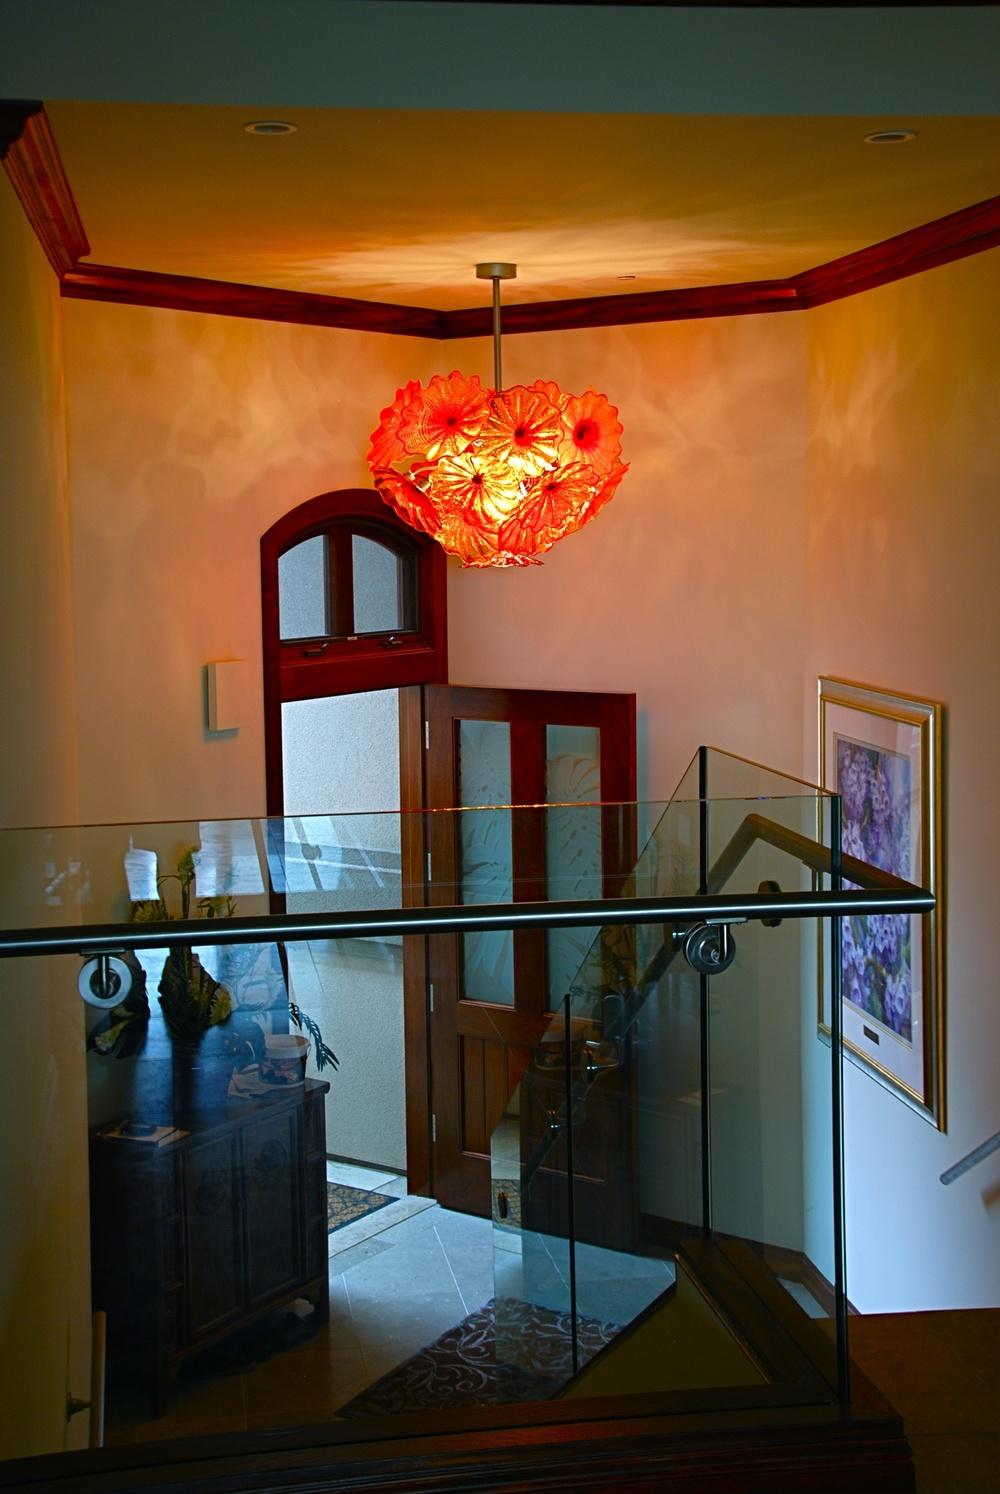 4 rondel chandelier baird by artist rick strini.jpg